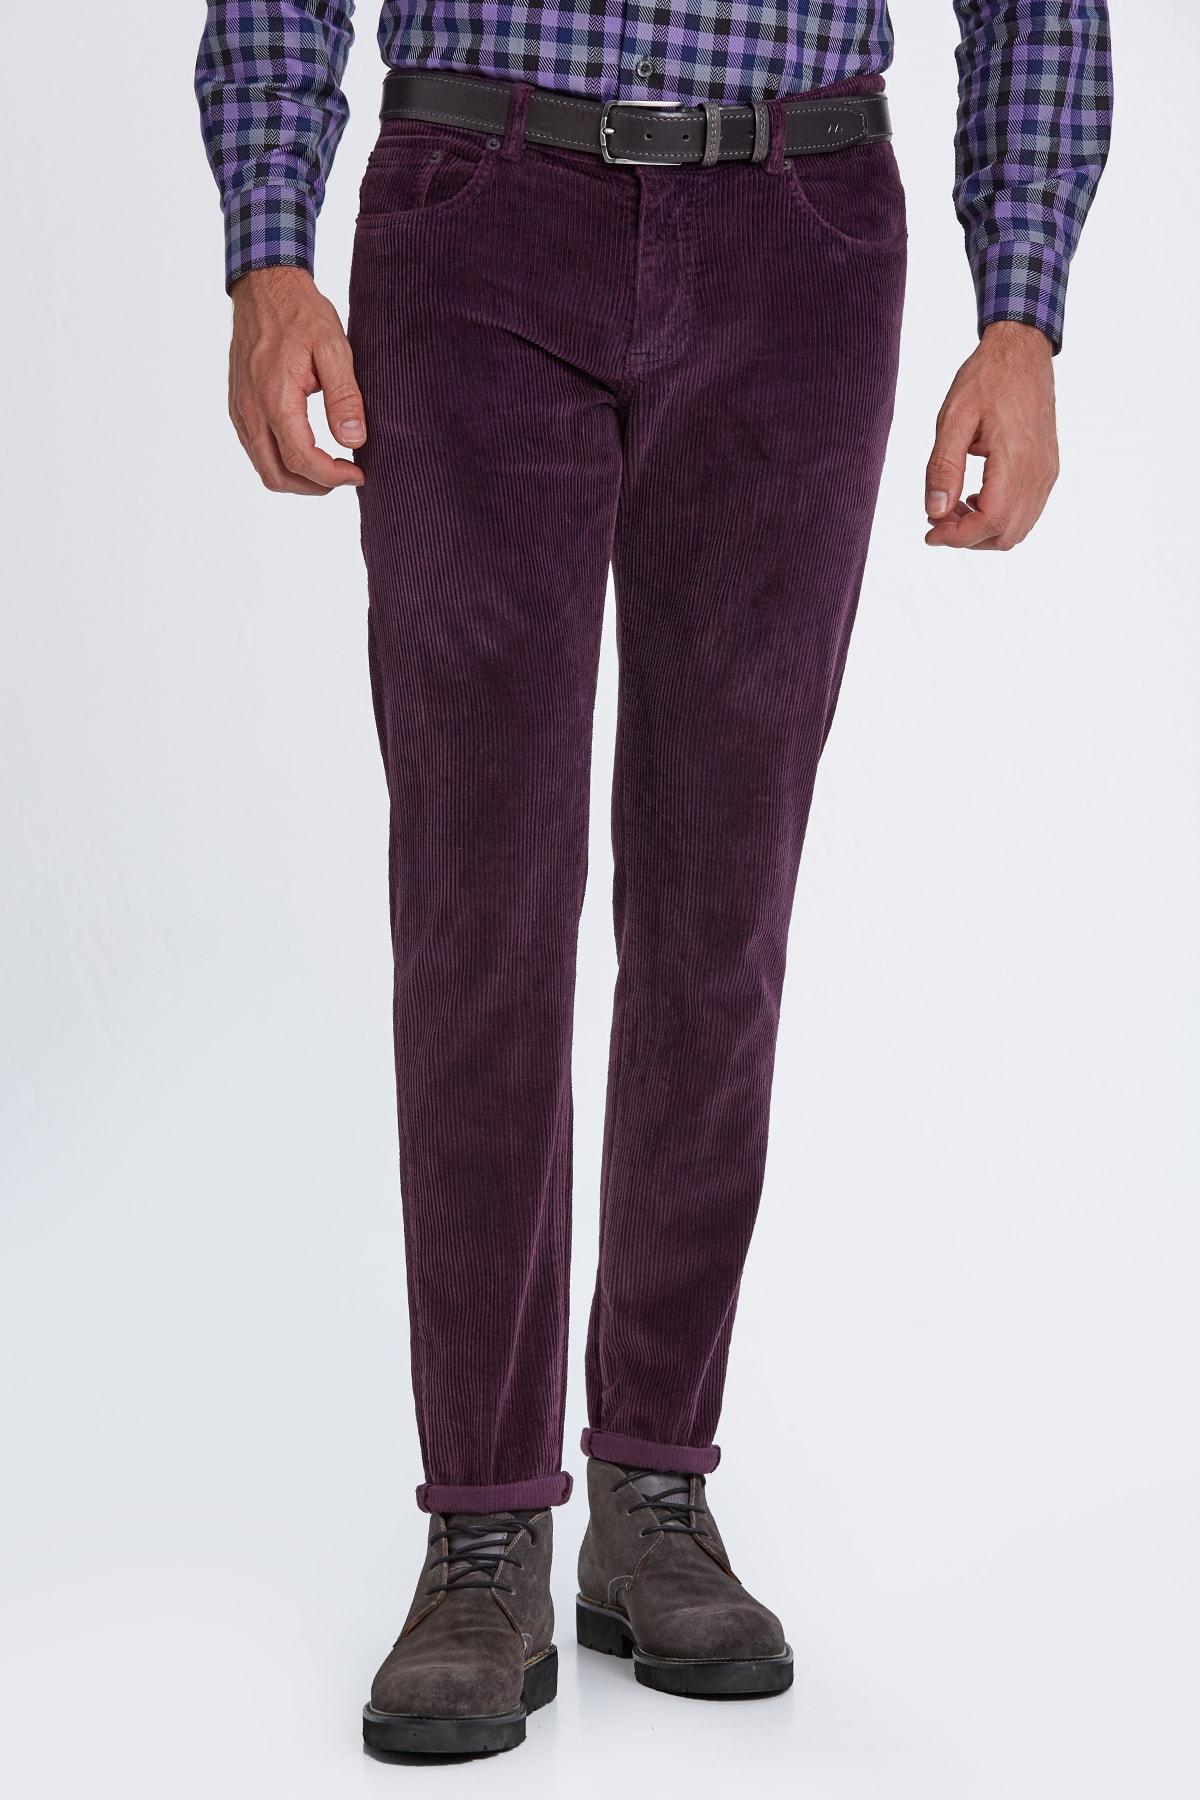 Hemington Erkek Koyu Mor Slim Fit Kadife Pantolon 1